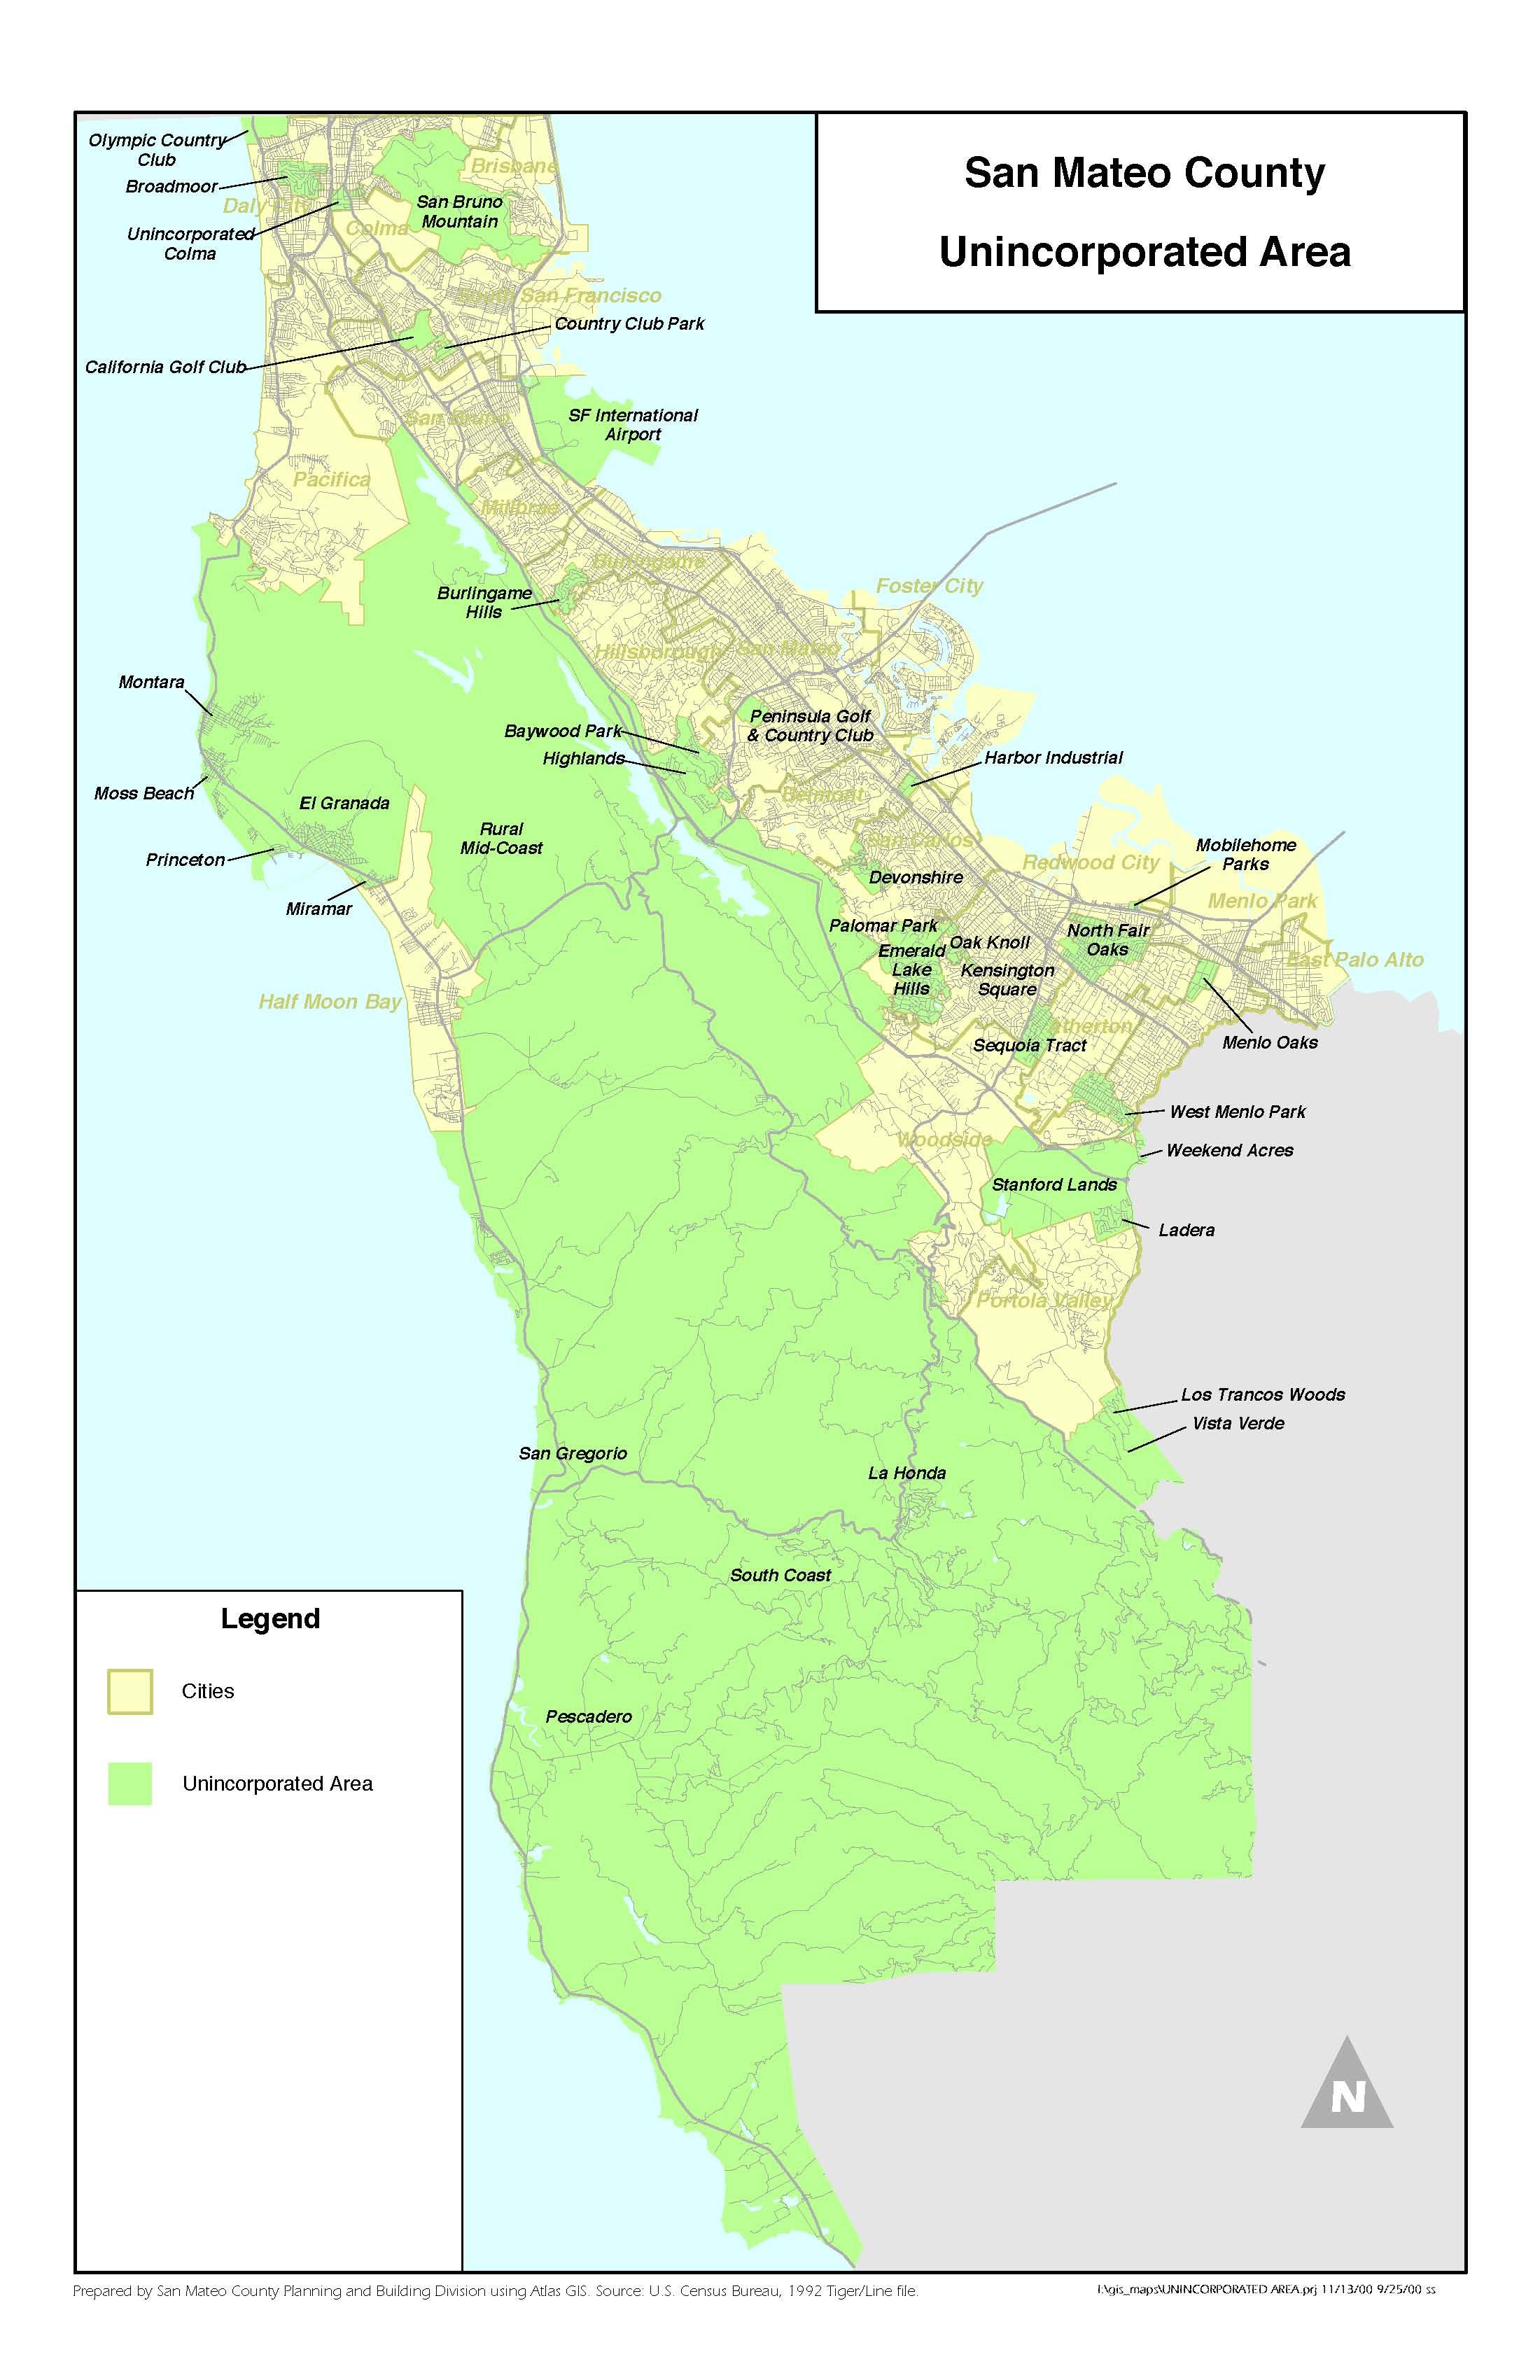 Where Is San Mateo California On The Map - Klipy - San Mateo California Map